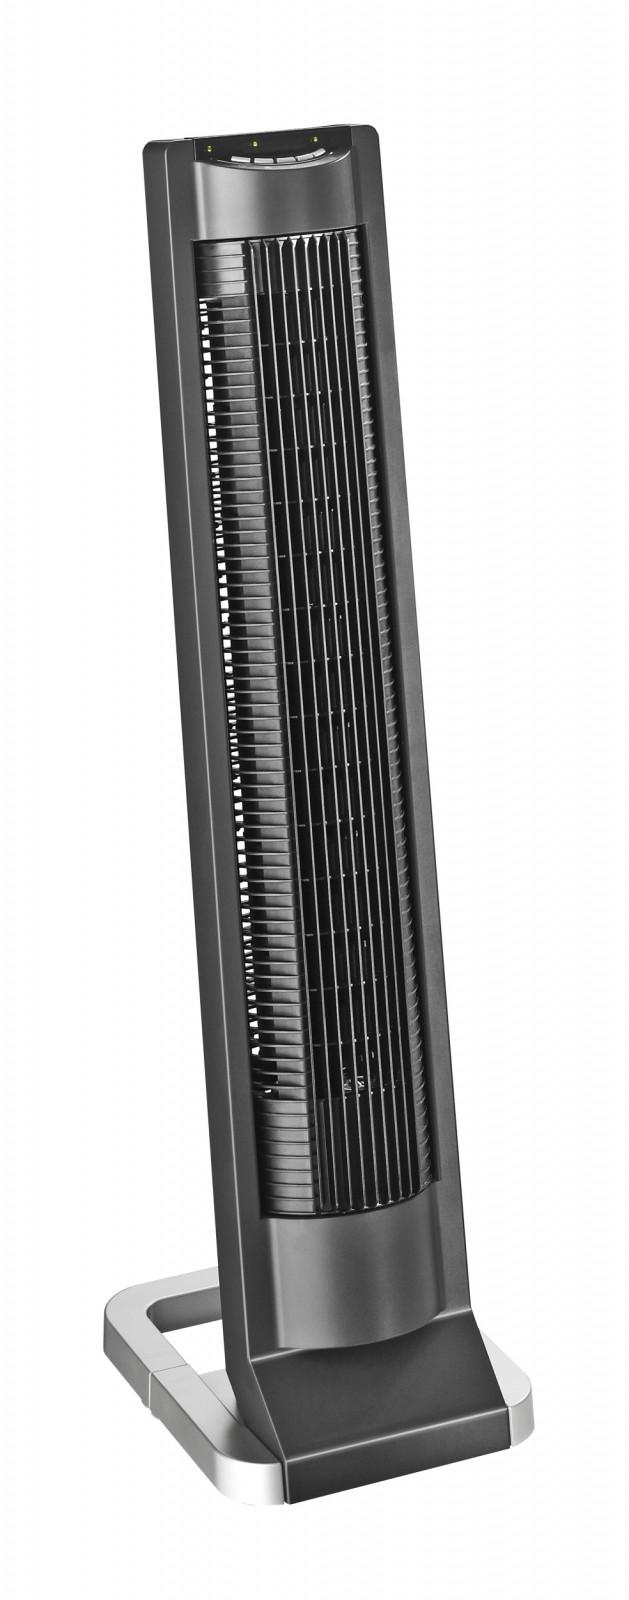 turmventilator s ulenventilator airos pin ii mit fernbedienung sommer ventilatoren aller art f r. Black Bedroom Furniture Sets. Home Design Ideas